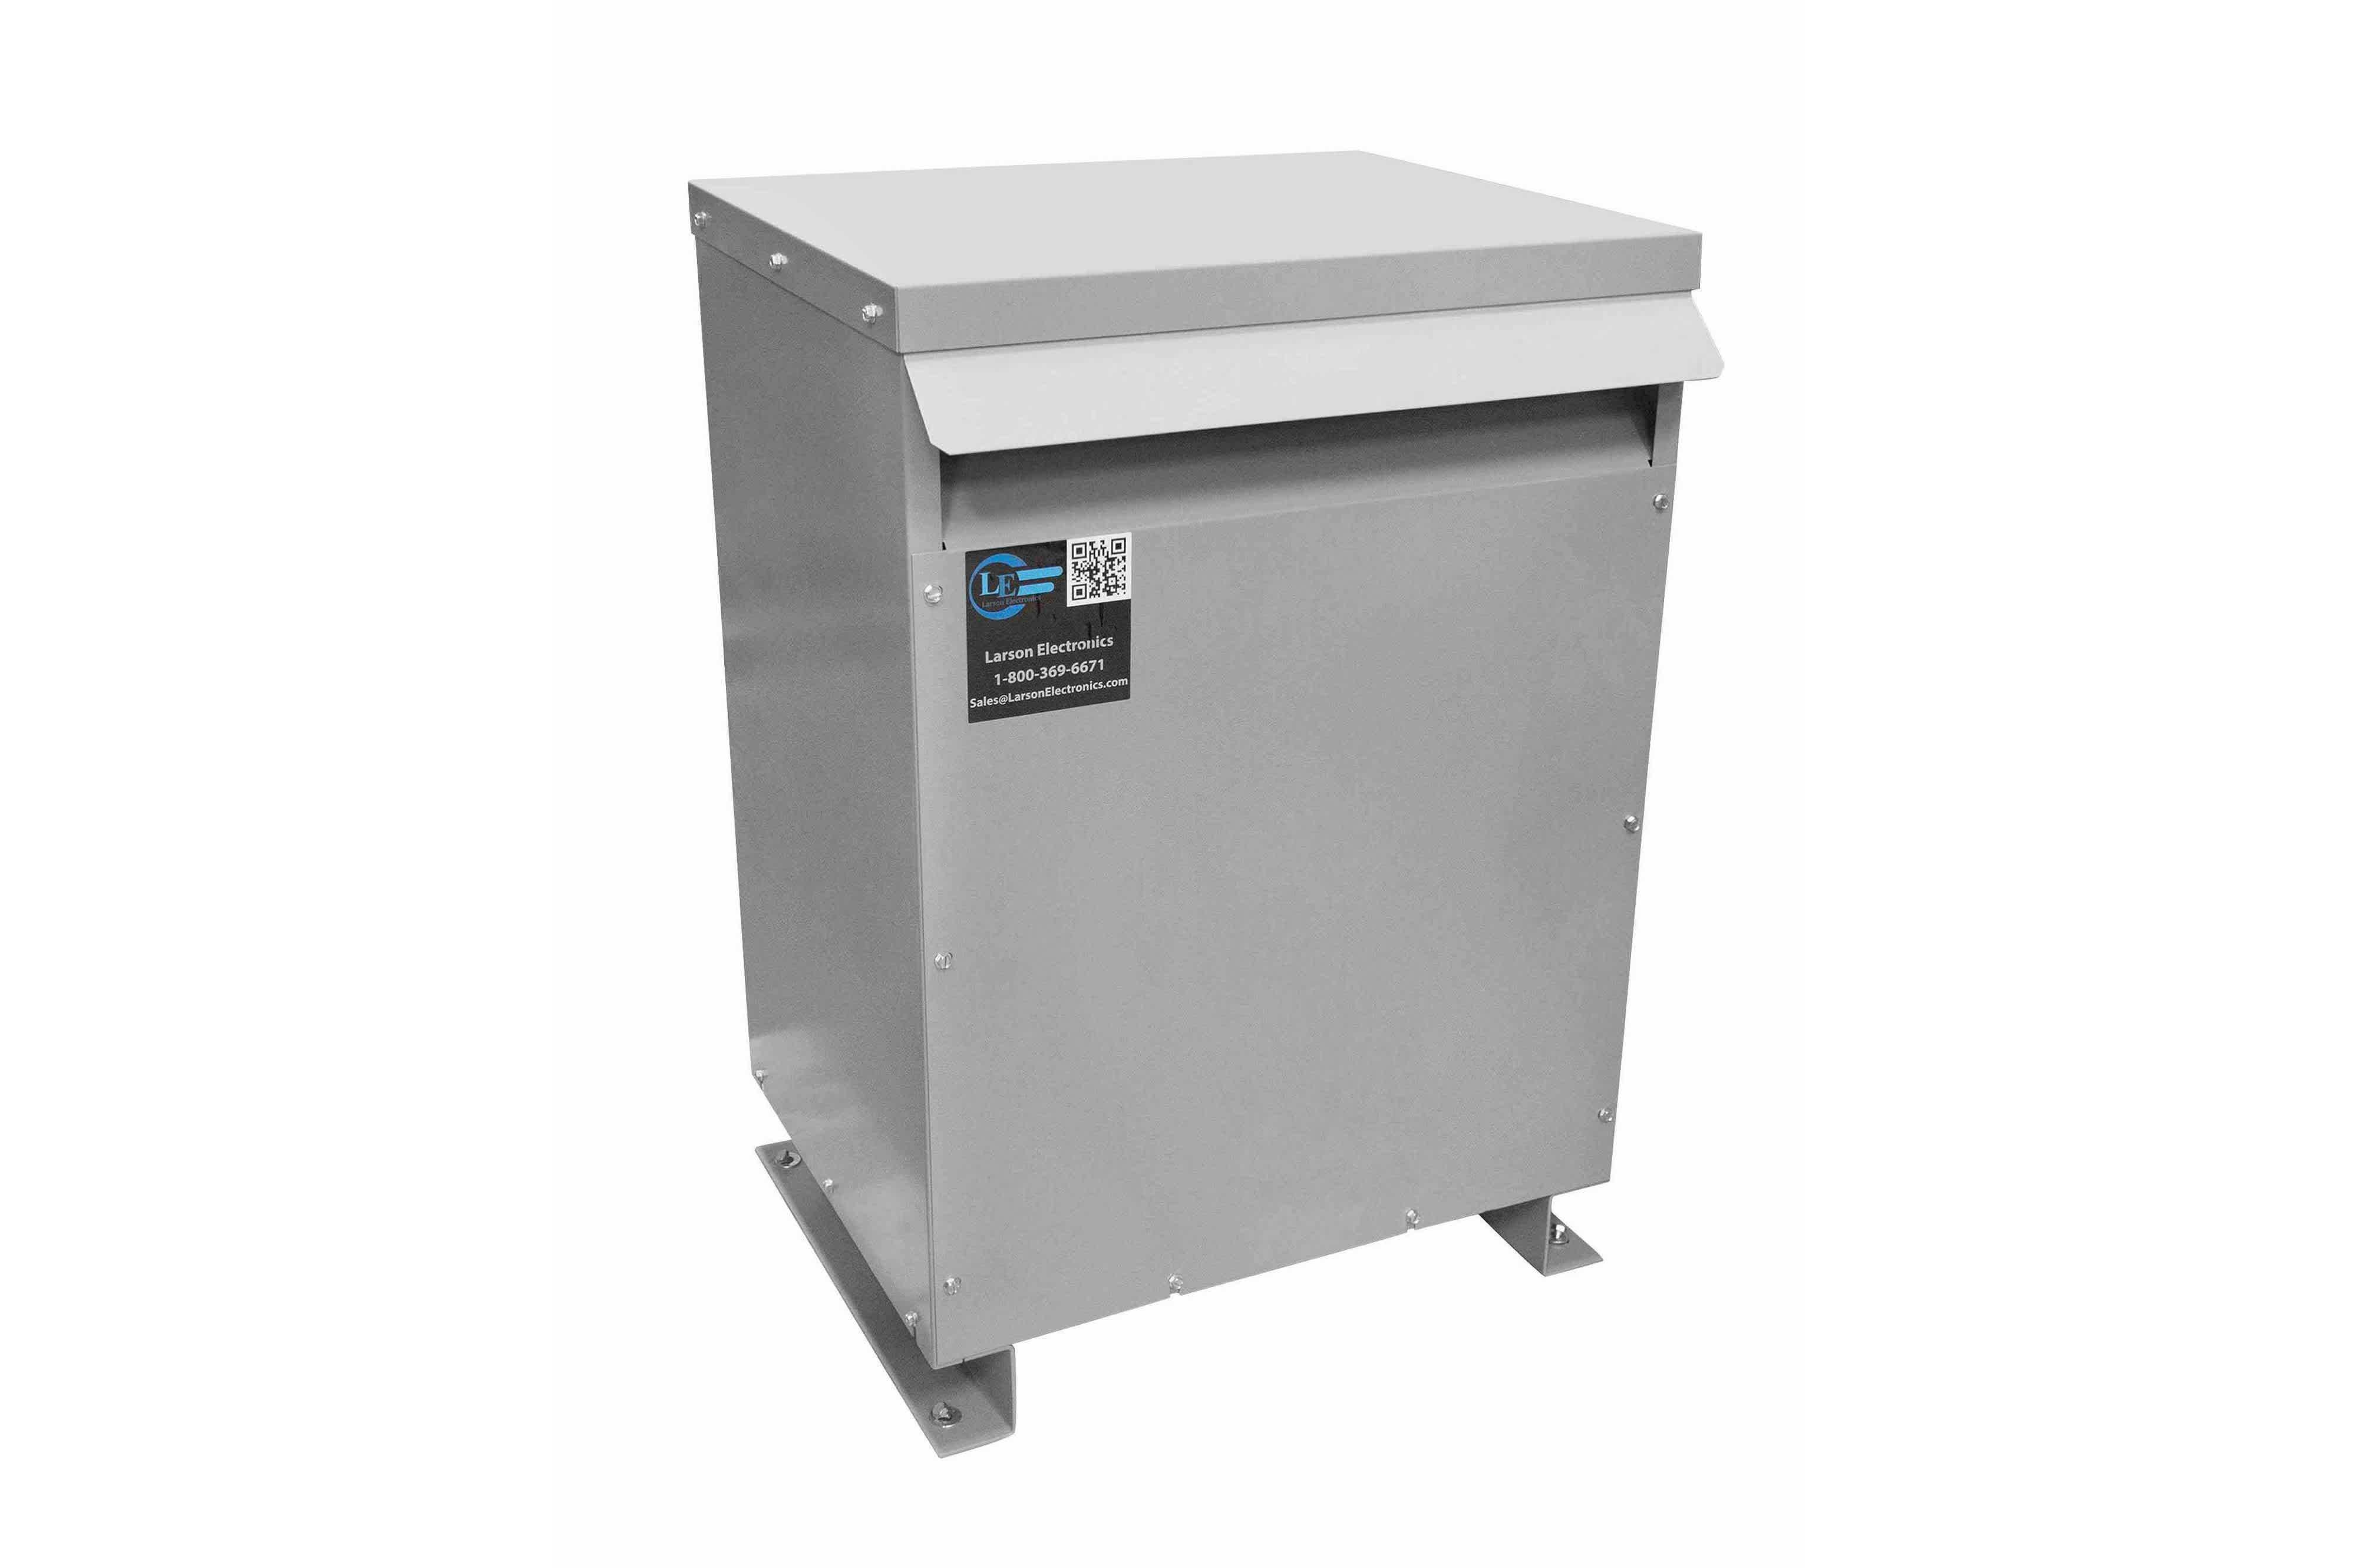 300 kVA 3PH Isolation Transformer, 415V Wye Primary, 480Y/277 Wye-N Secondary, N3R, Ventilated, 60 Hz